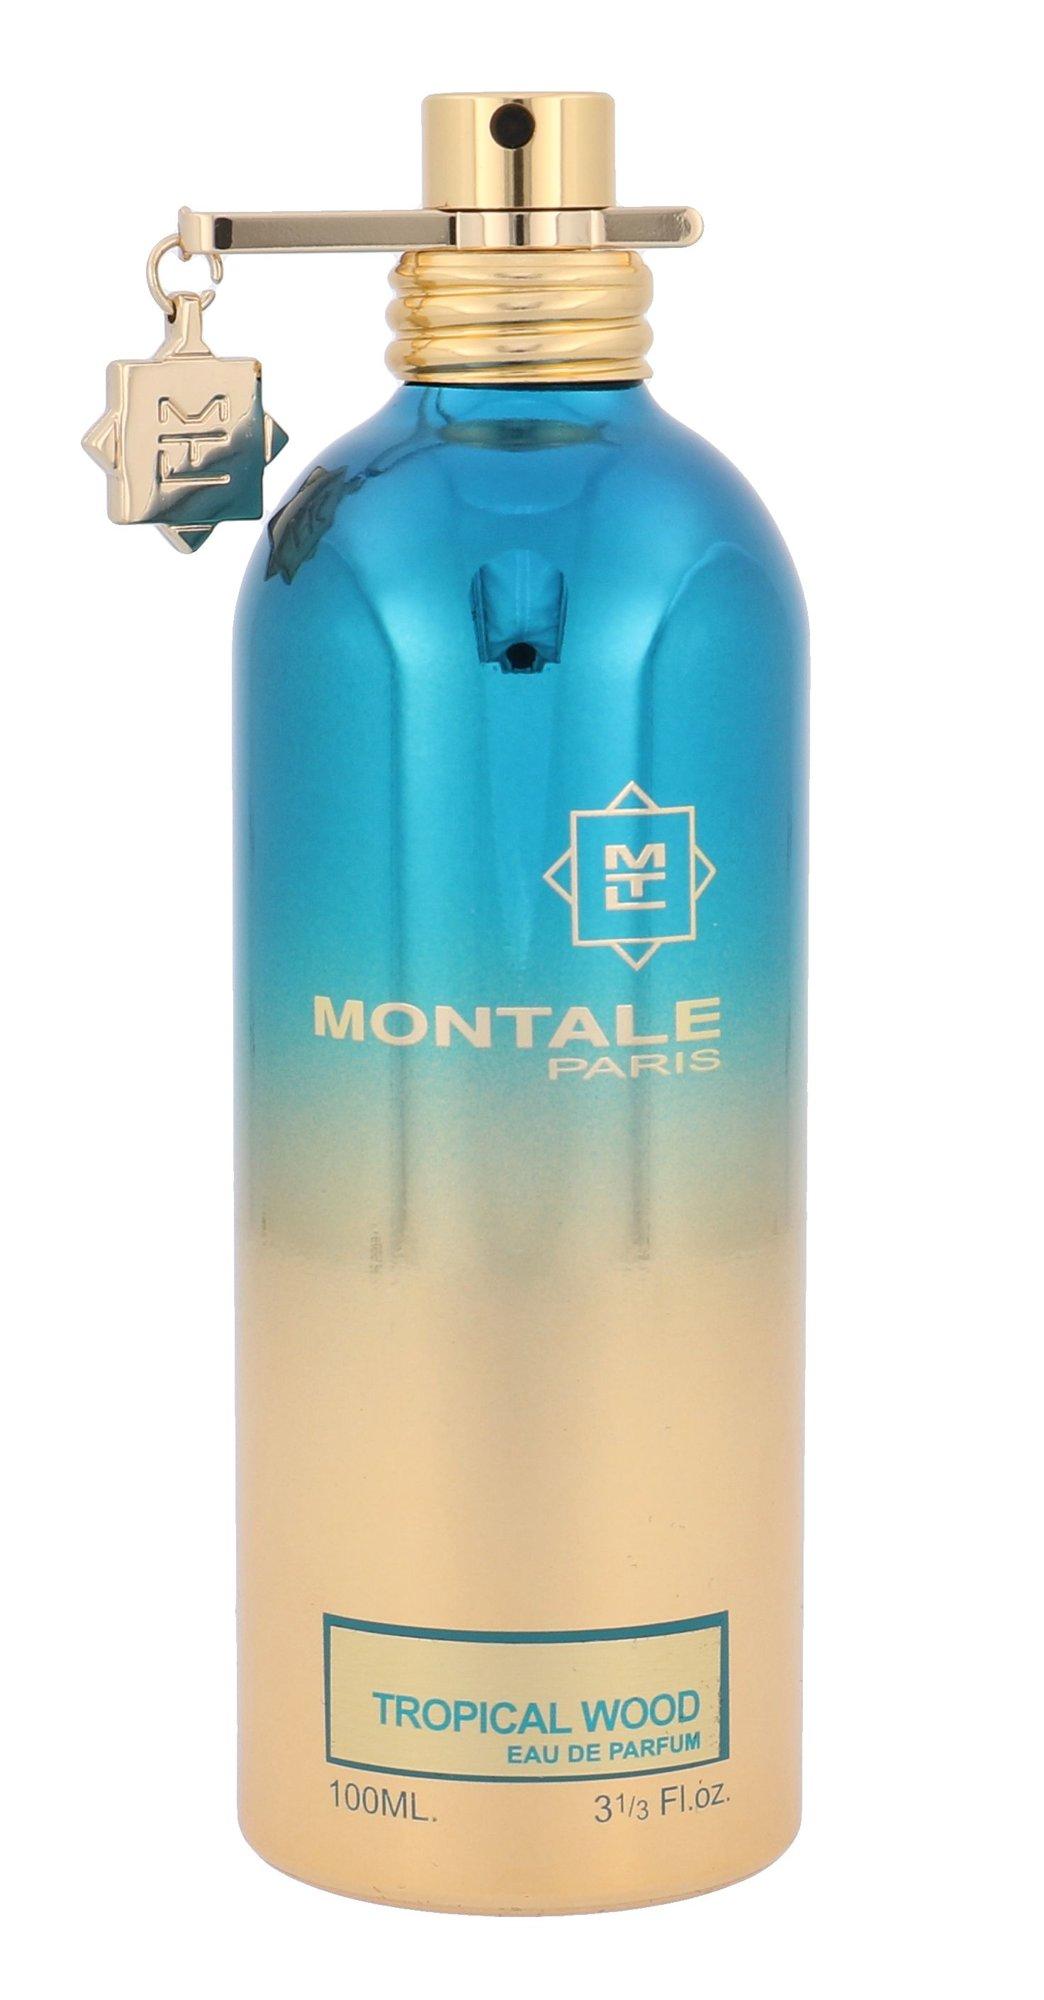 Montale Paris Tropical Wood EDP 100ml